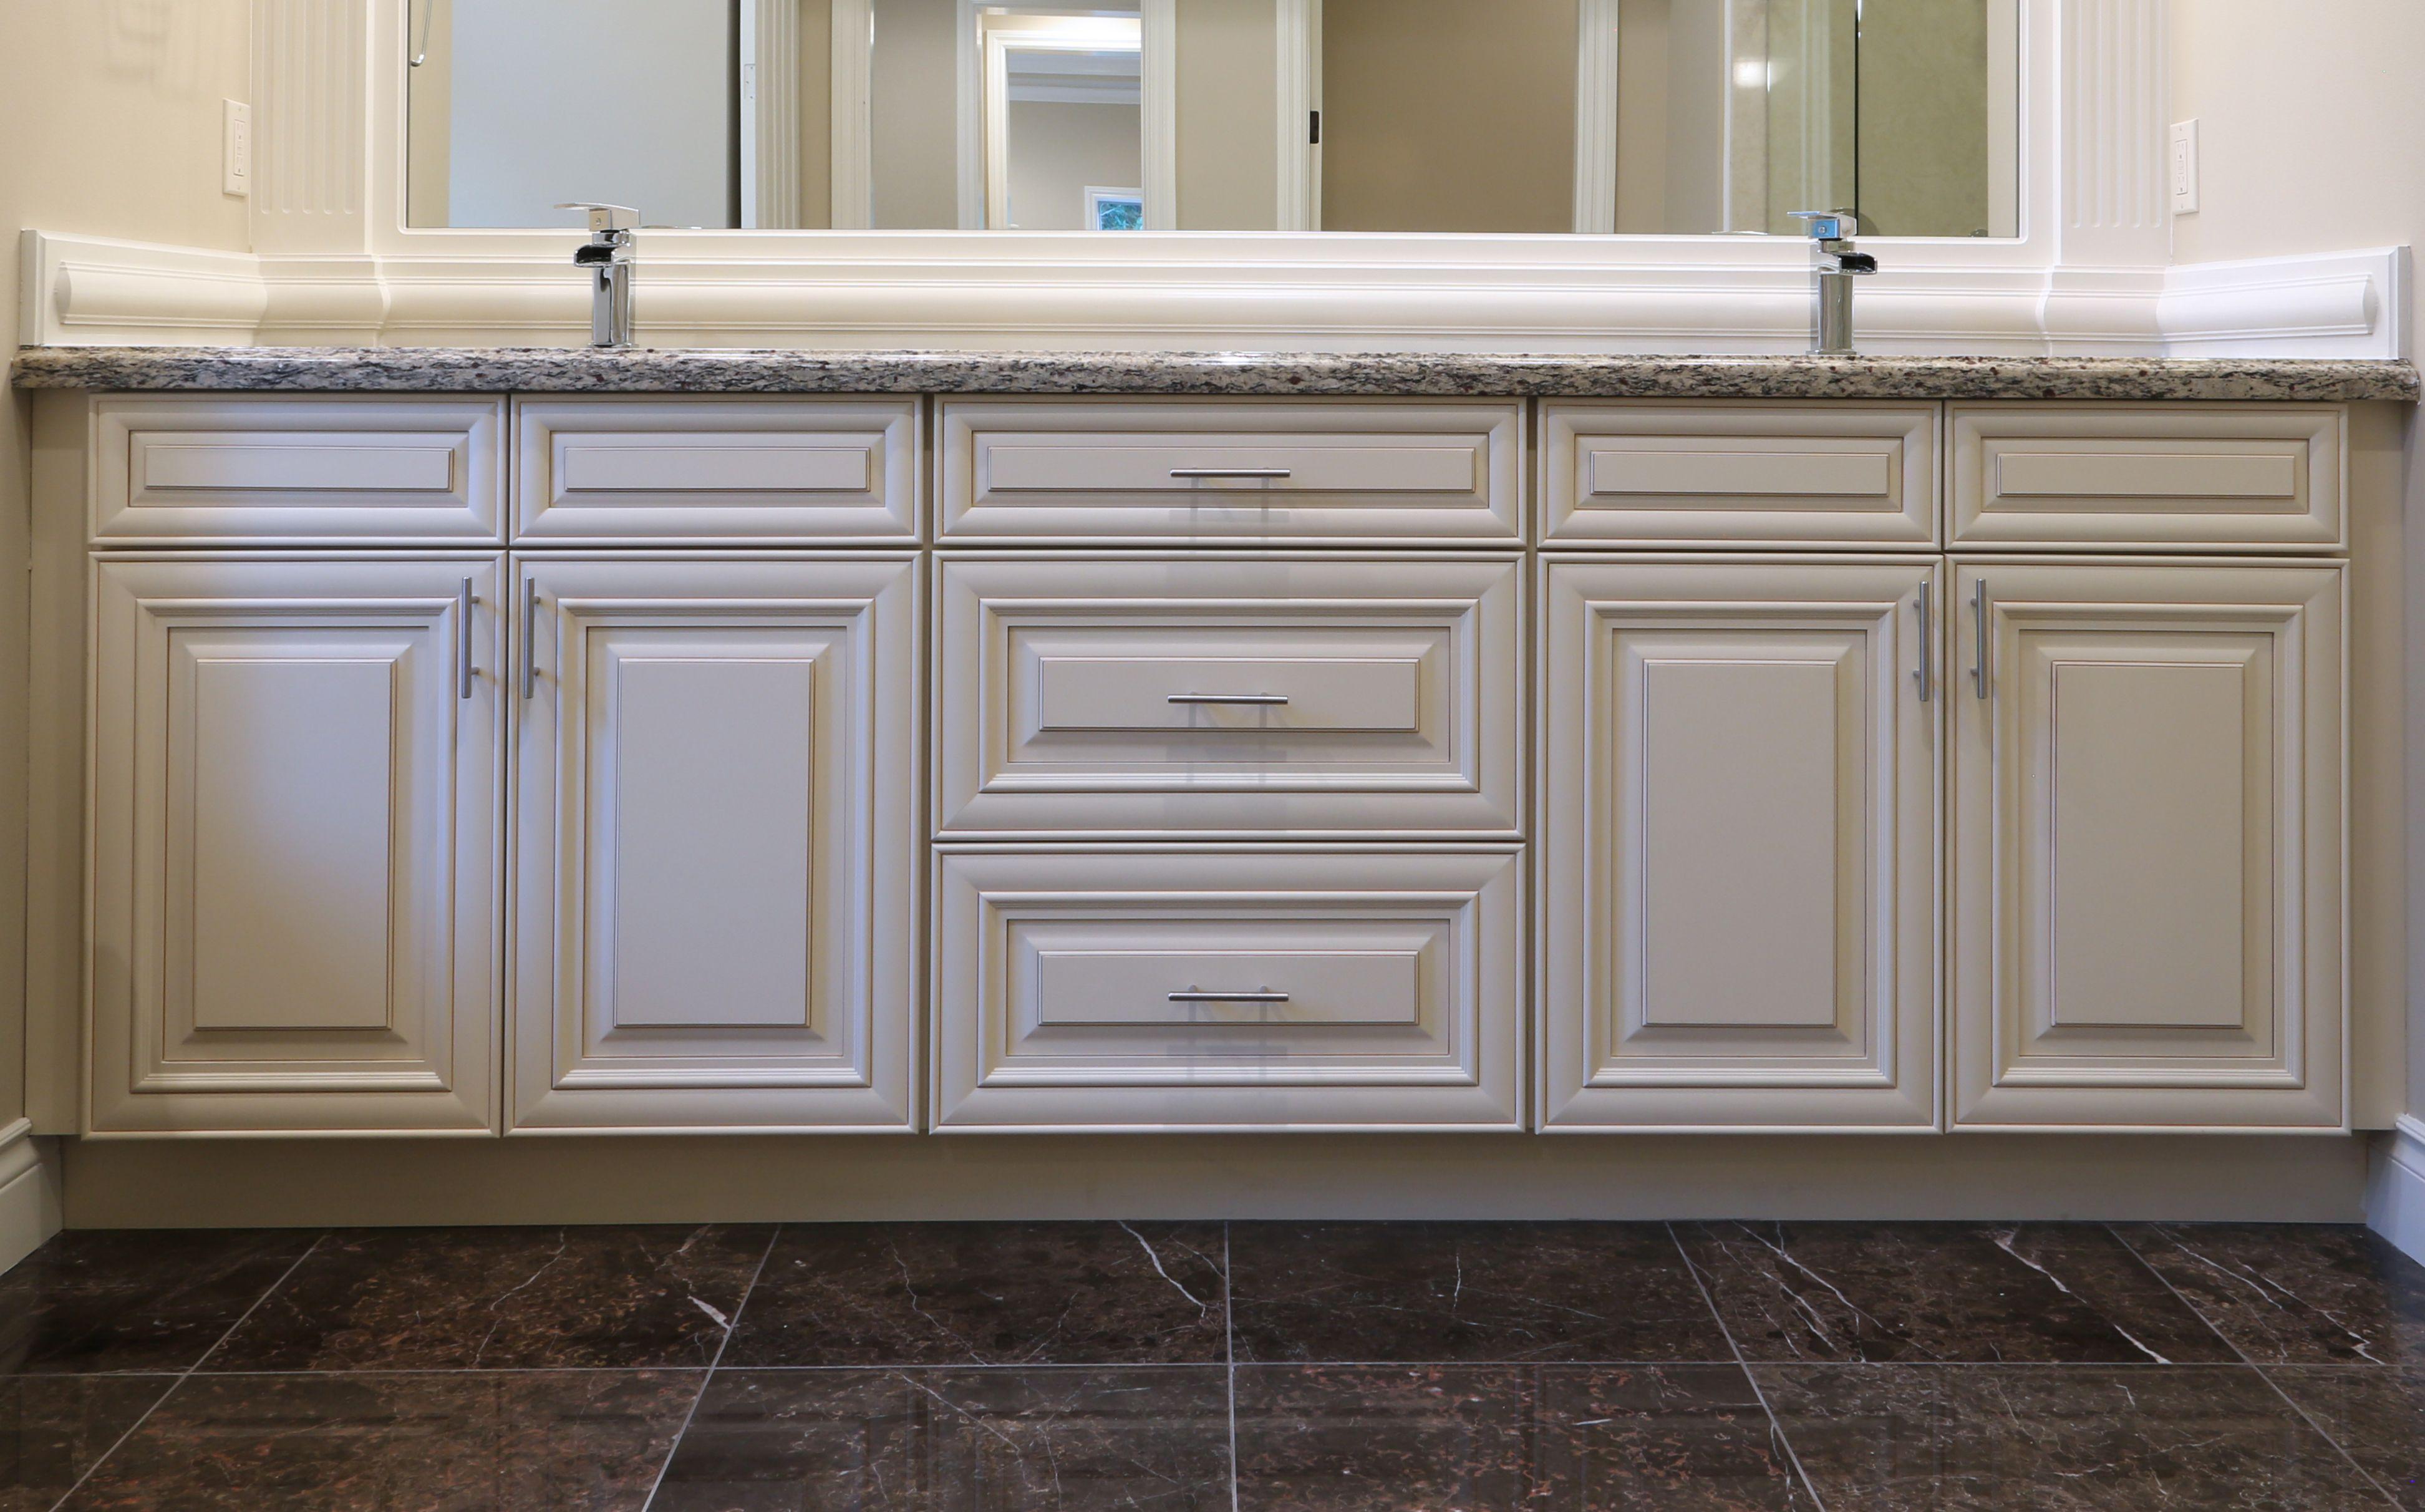 Crème Glazed Cabinet